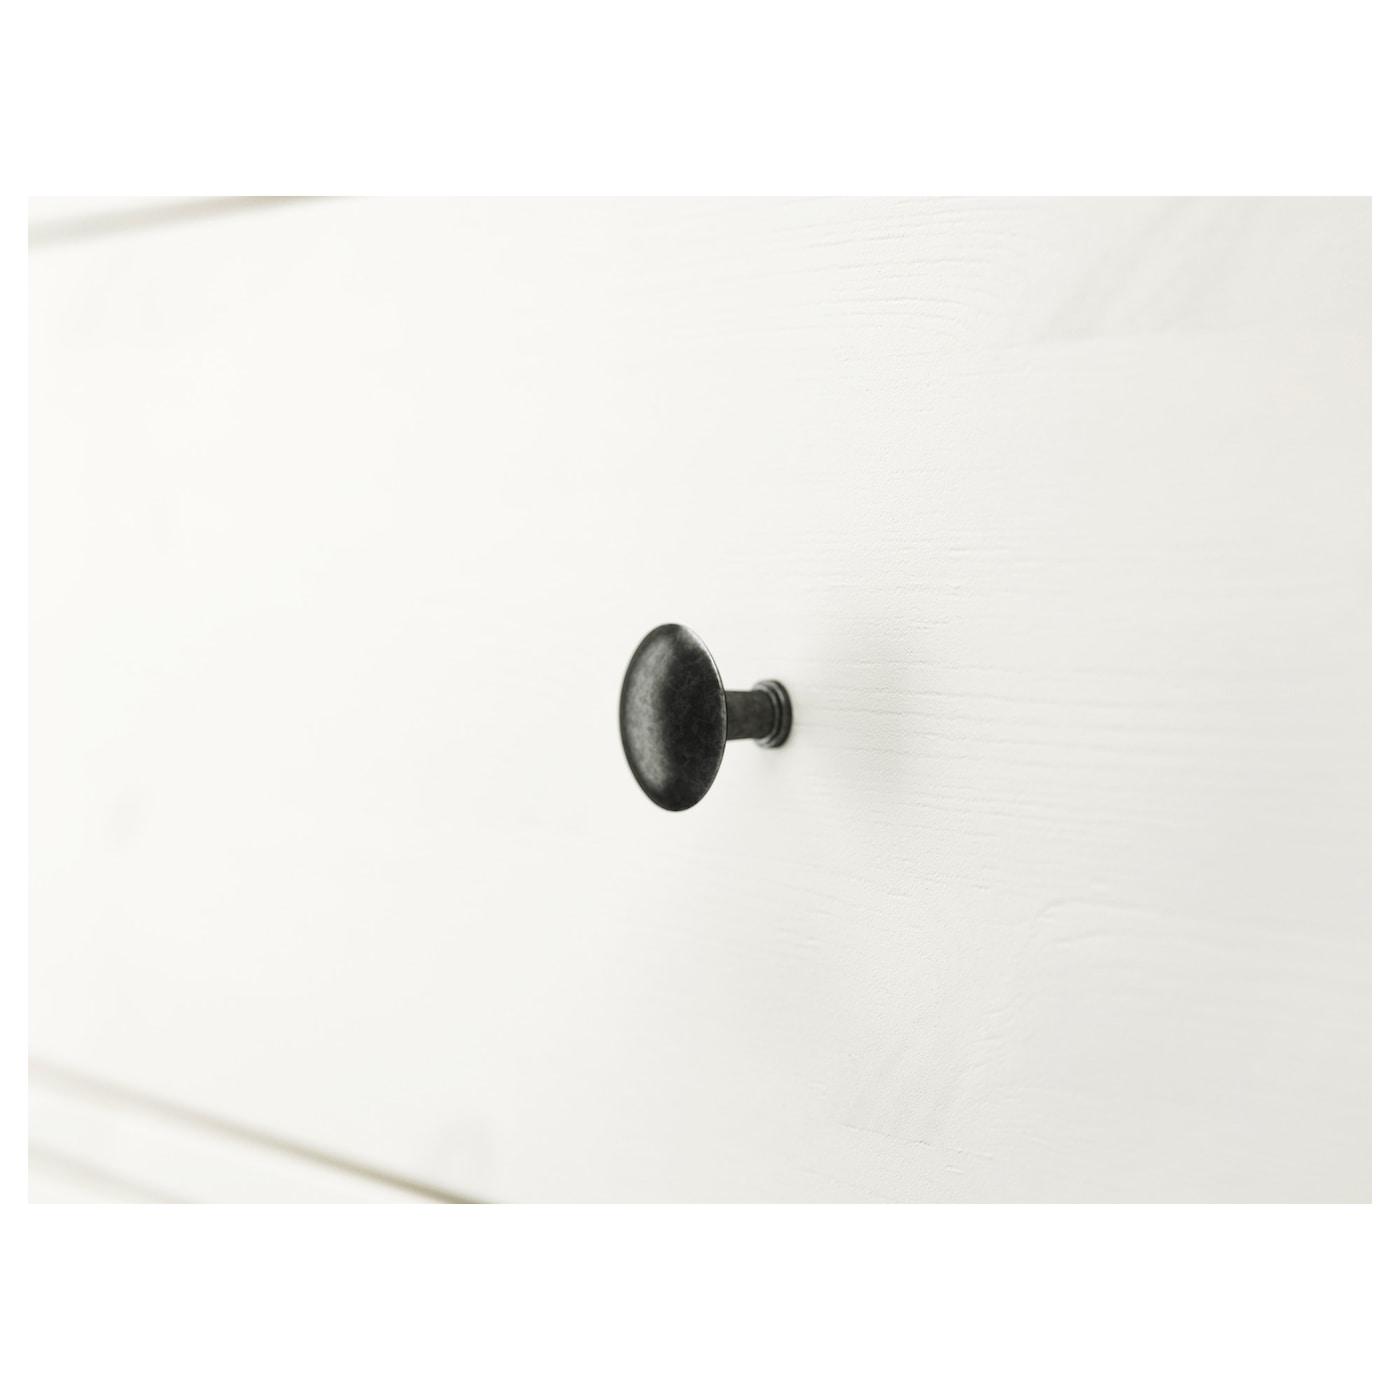 HEMNES Byrå med 3 lådor, vitbets, 108x96 cm